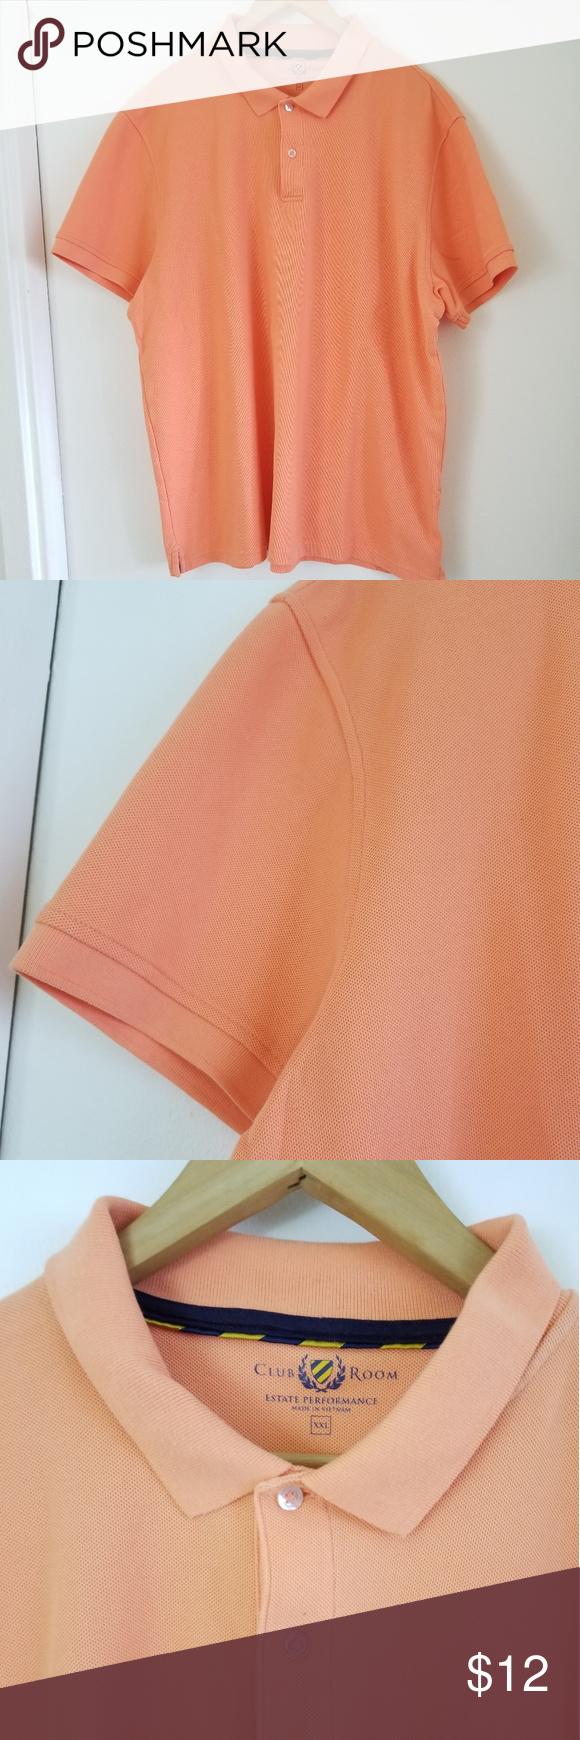 Classroom Unisex Short Sleeve Pique knit Polo Small Khaki